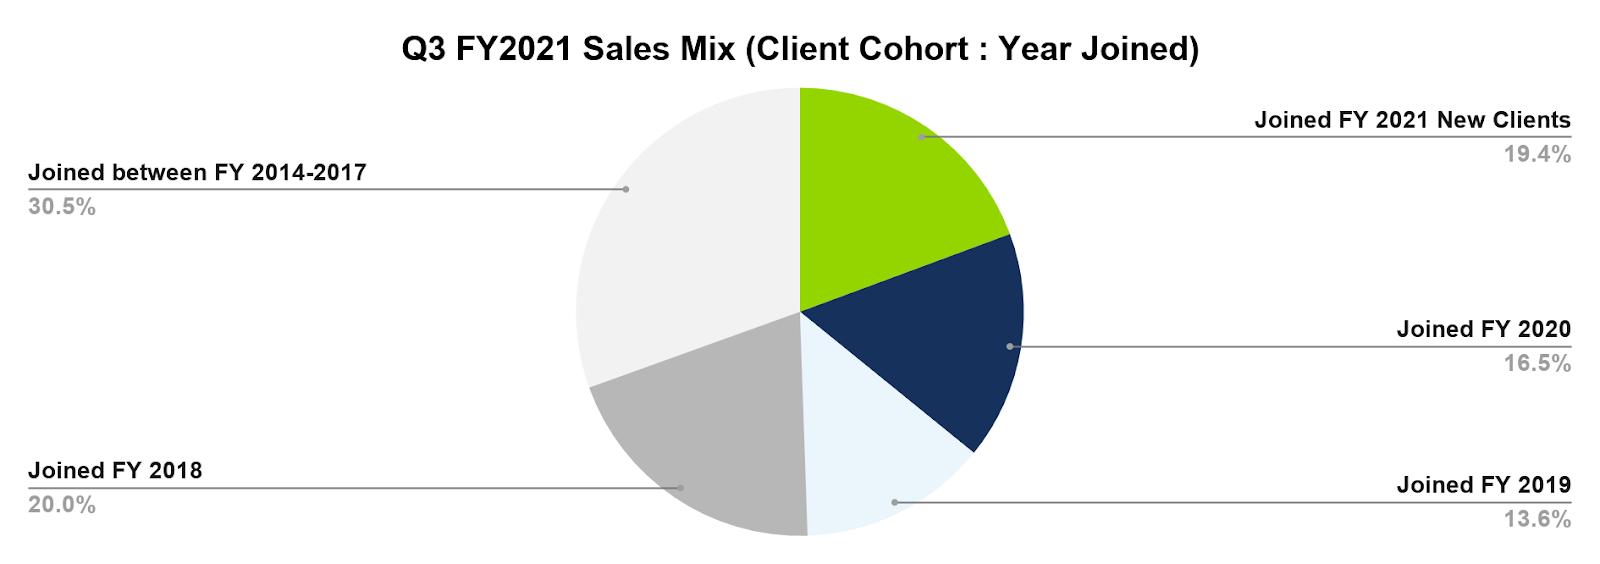 Q3 sales mix pie chart